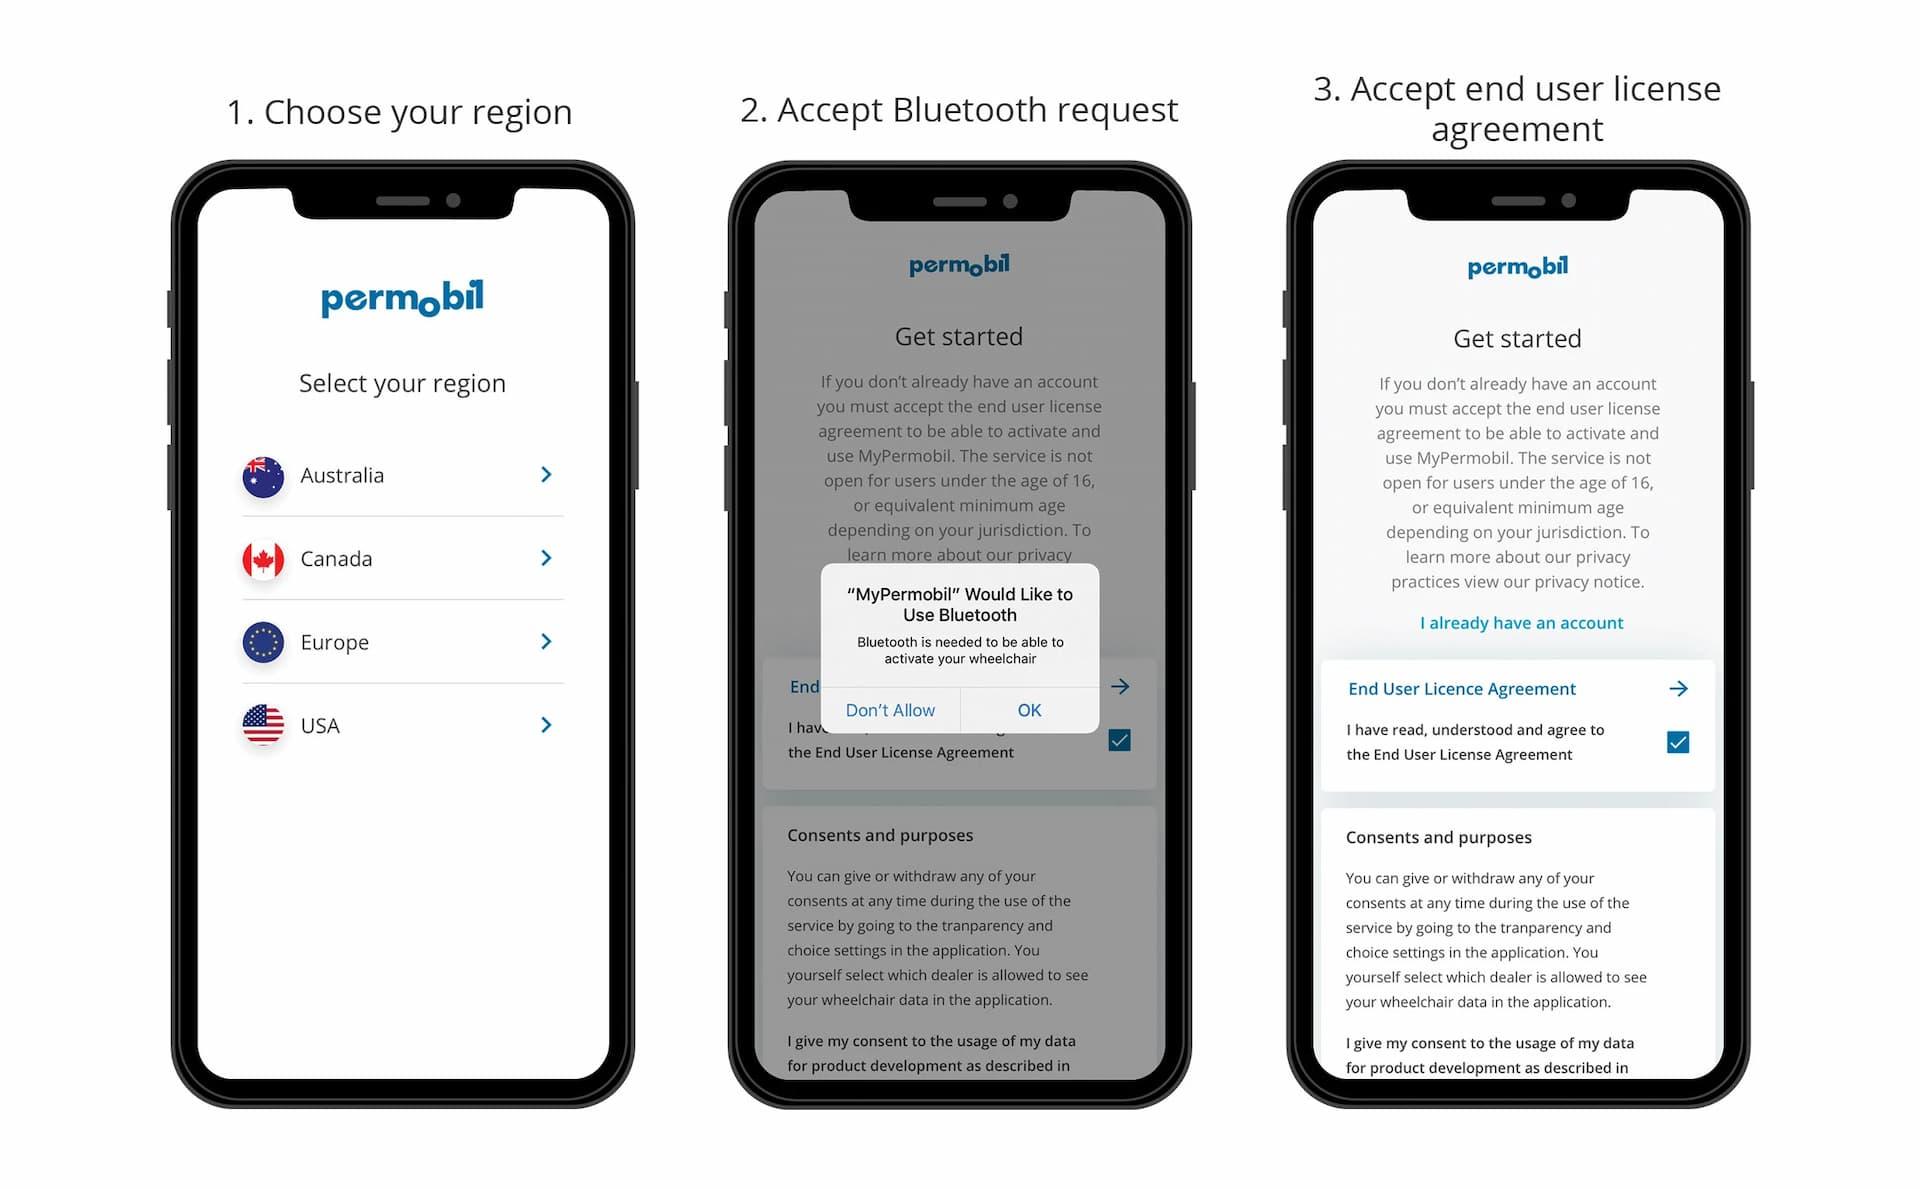 MyPermobil-Activation-Steps-1-3 (2) (1)